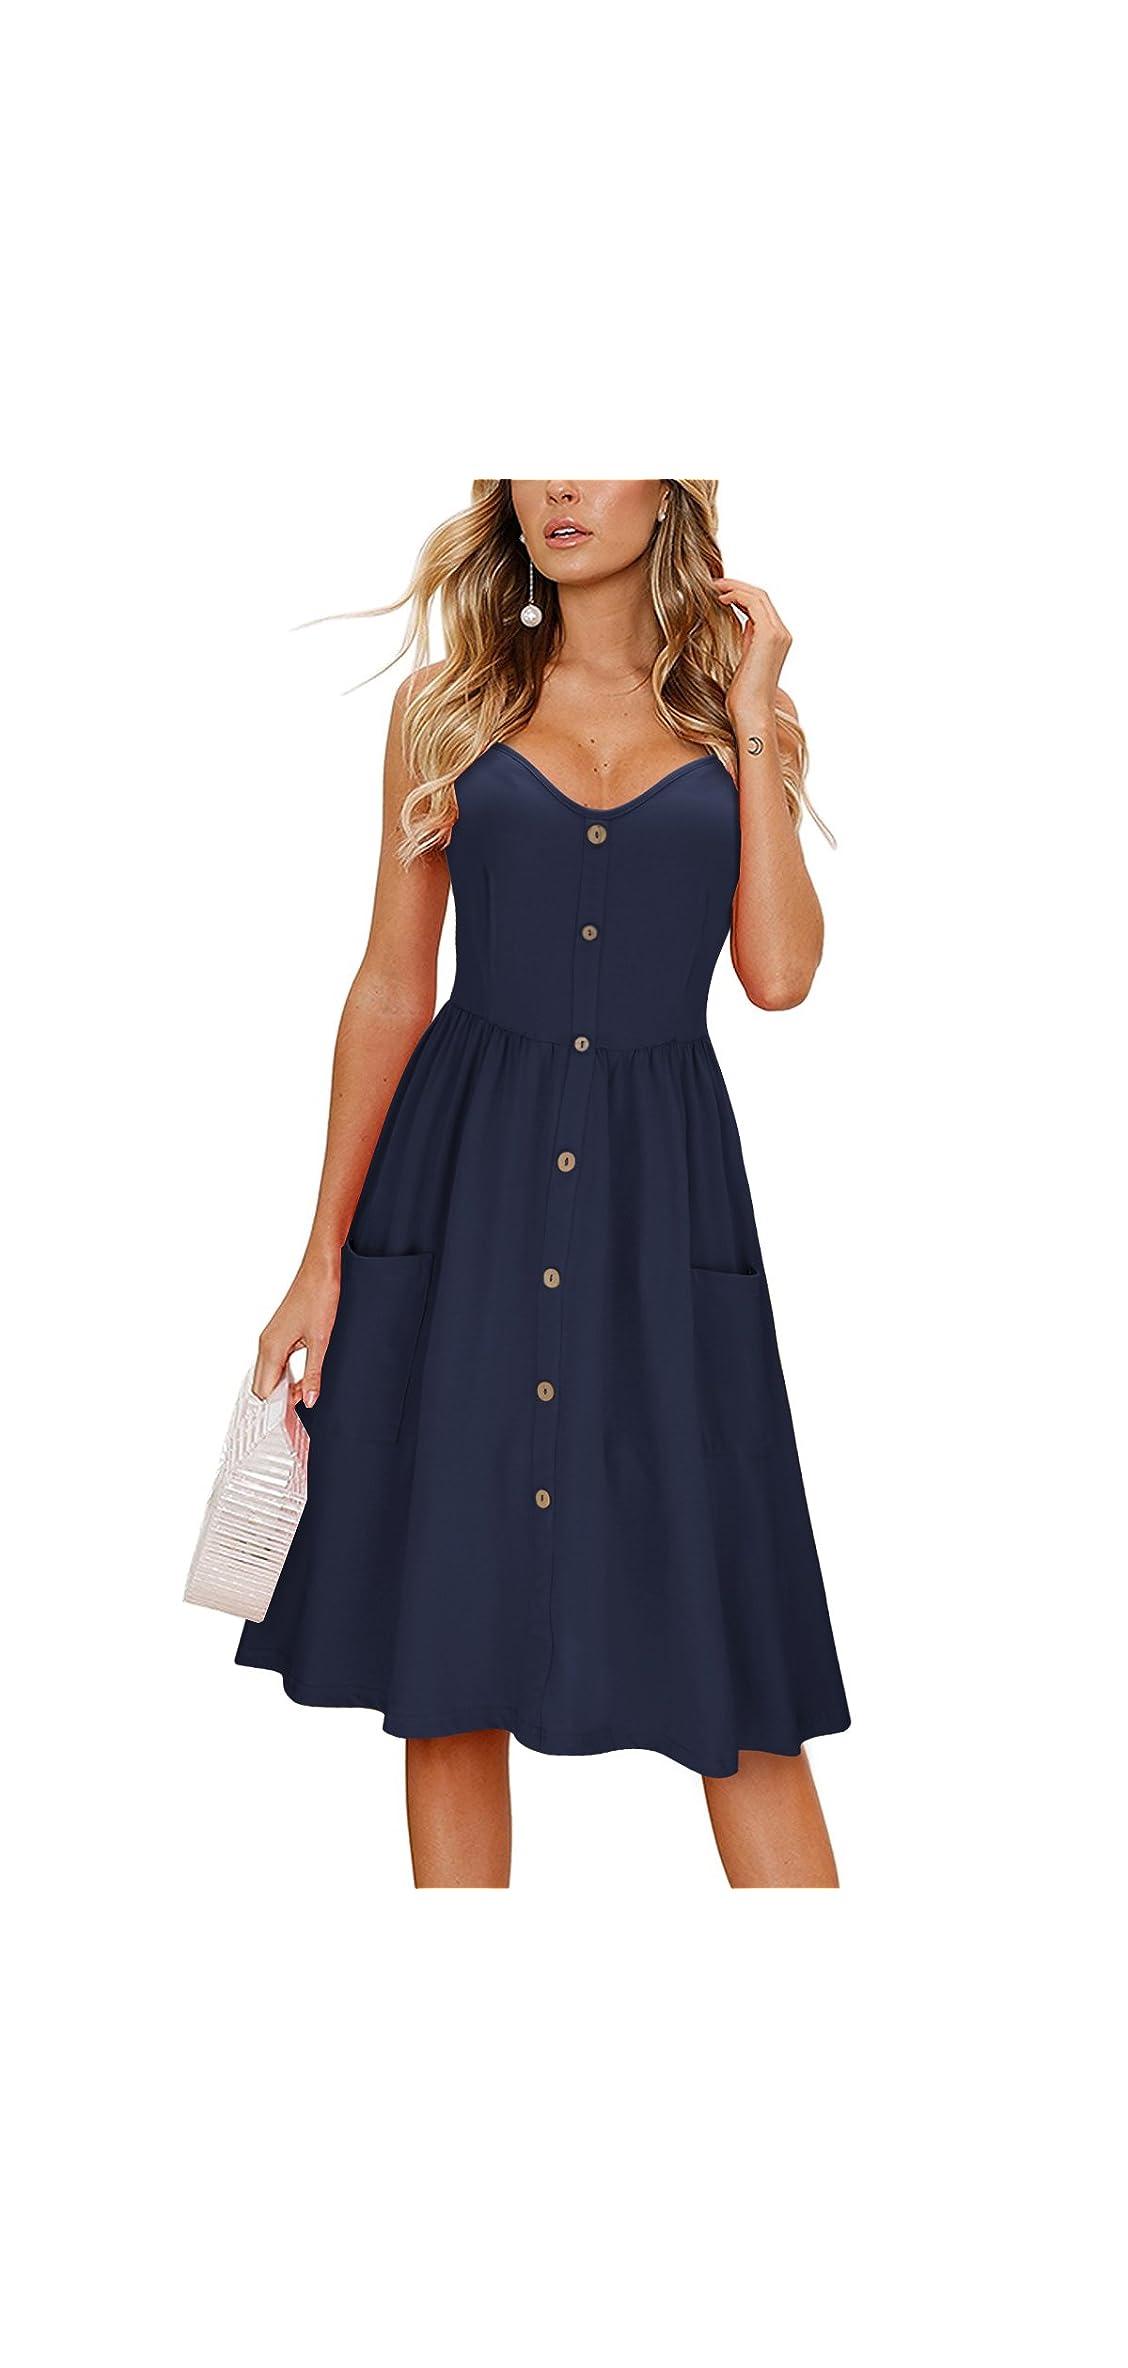 Women's Summer Sundress Spaghetti Strap Button Down Dress